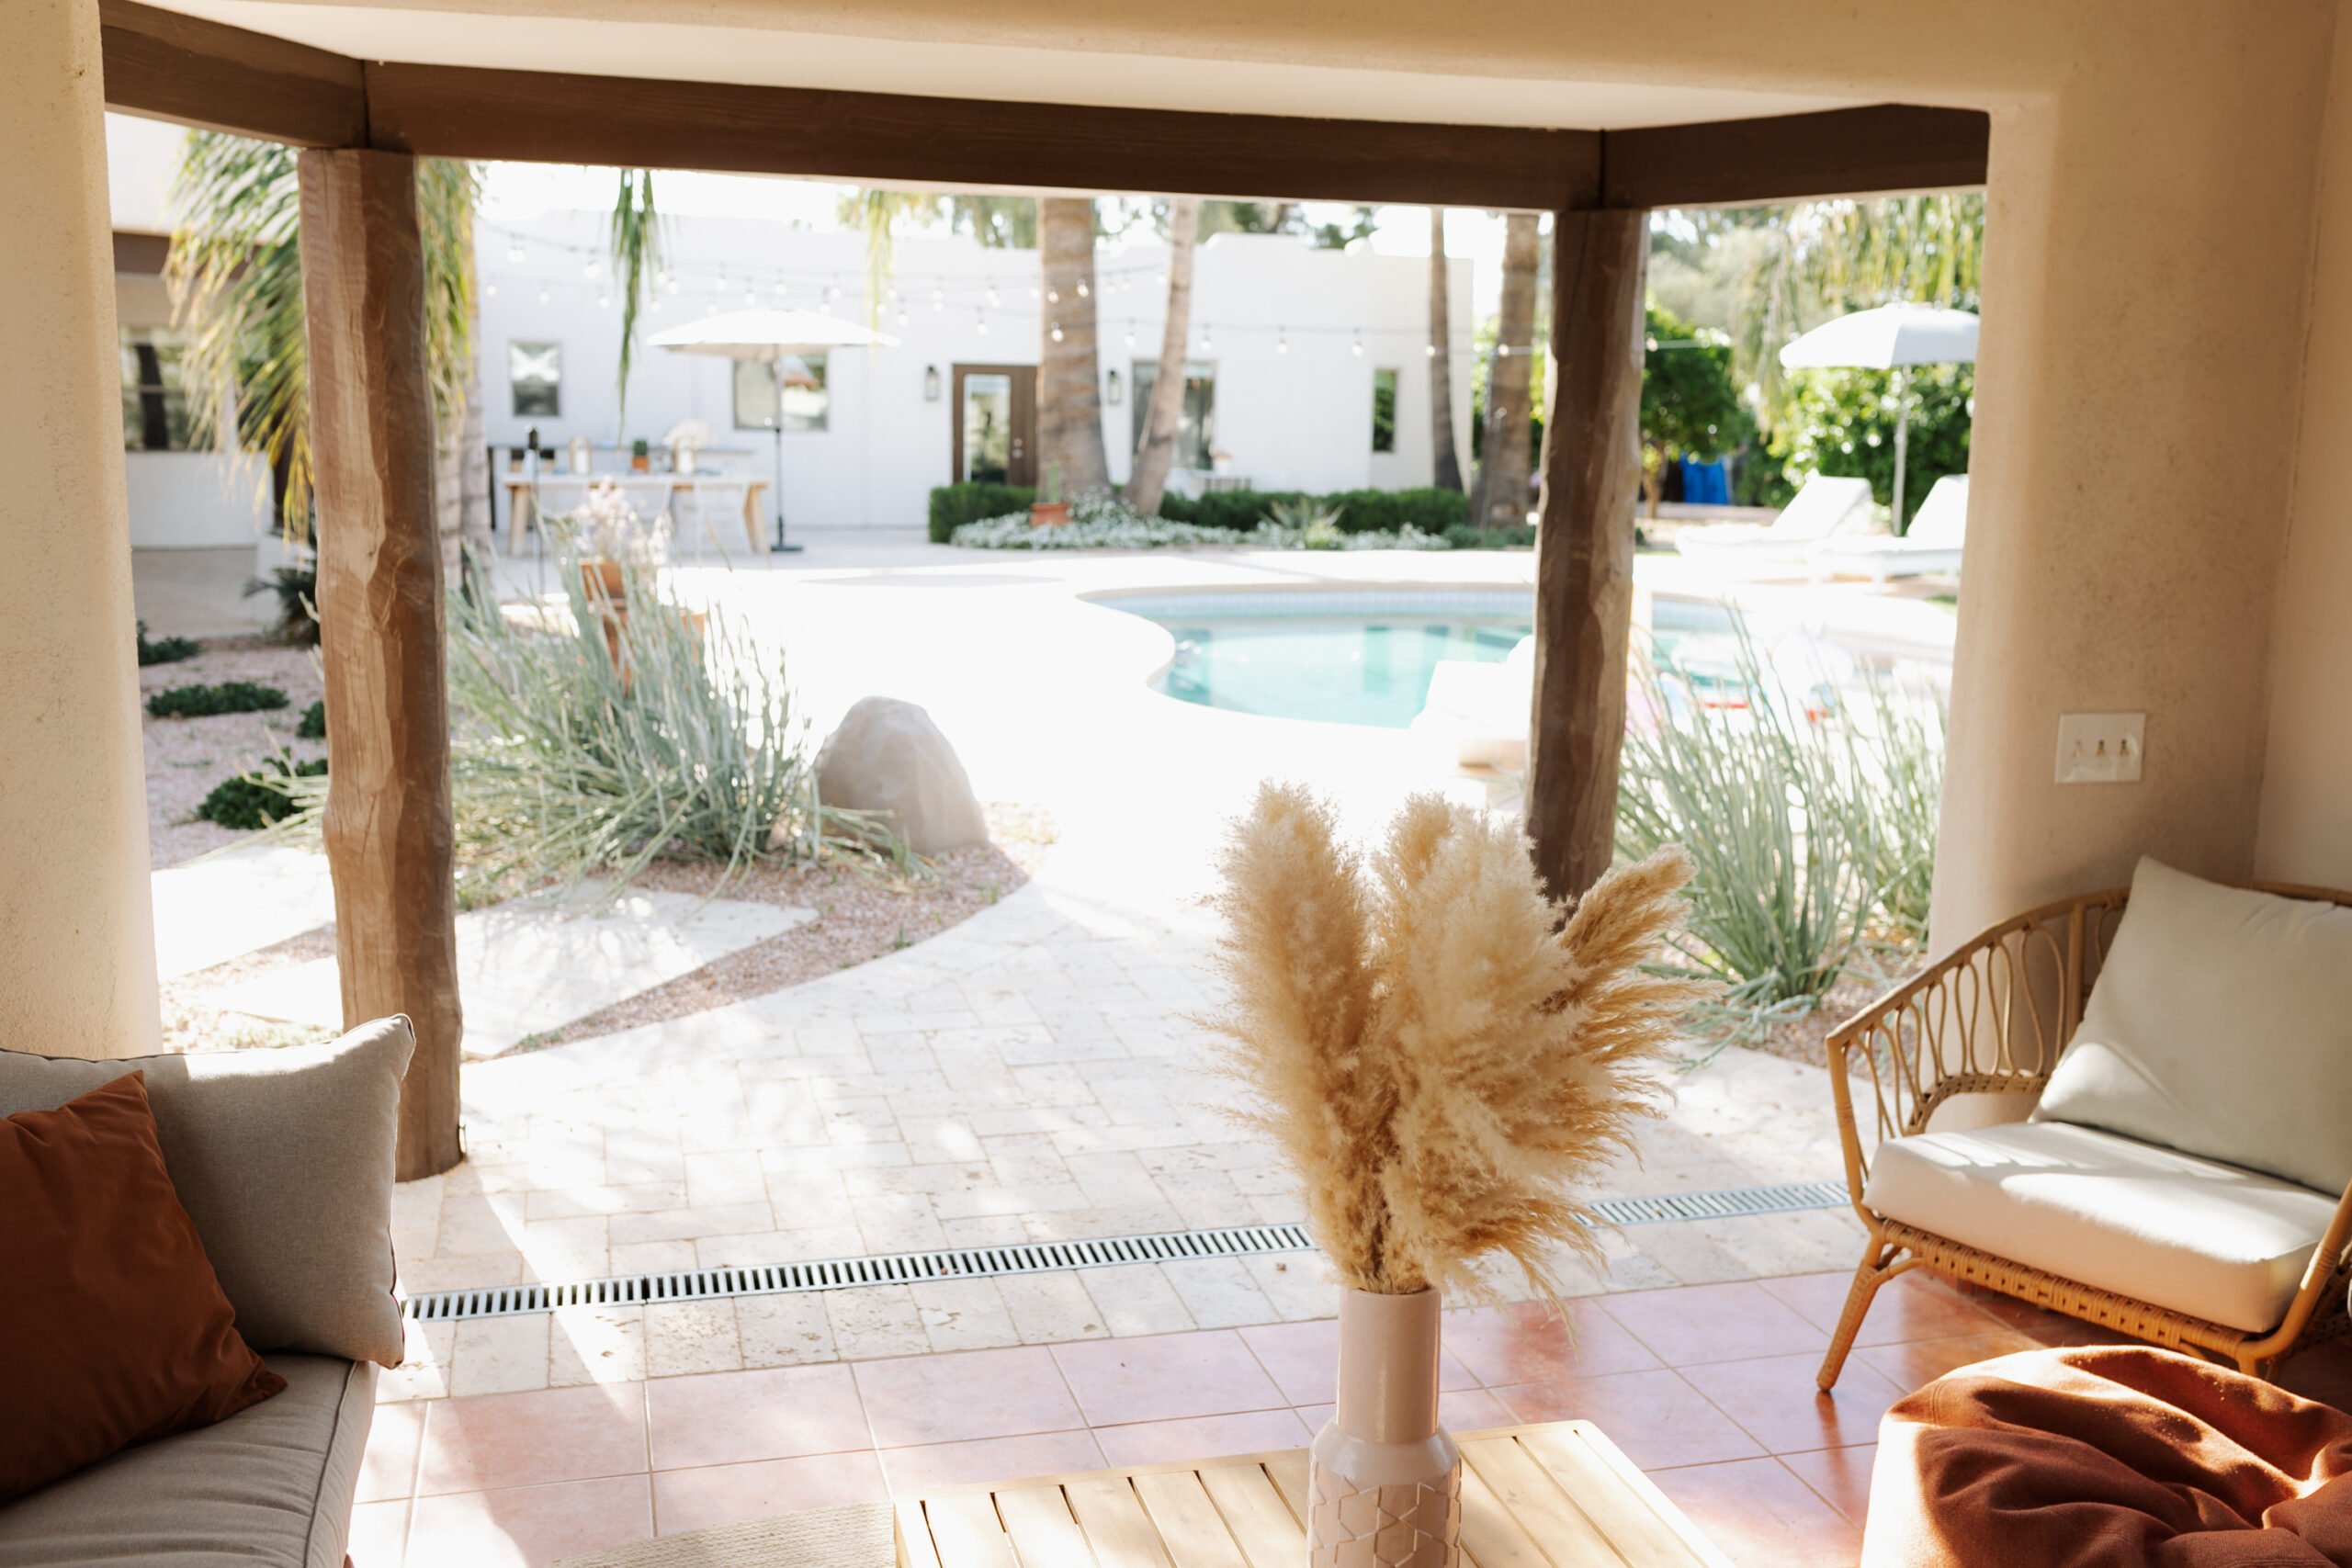 the view from our pool ramada, with modern furniture and a beachy boho vibe #modernbackyard #arizonaliving #poolramada #backyarddesign